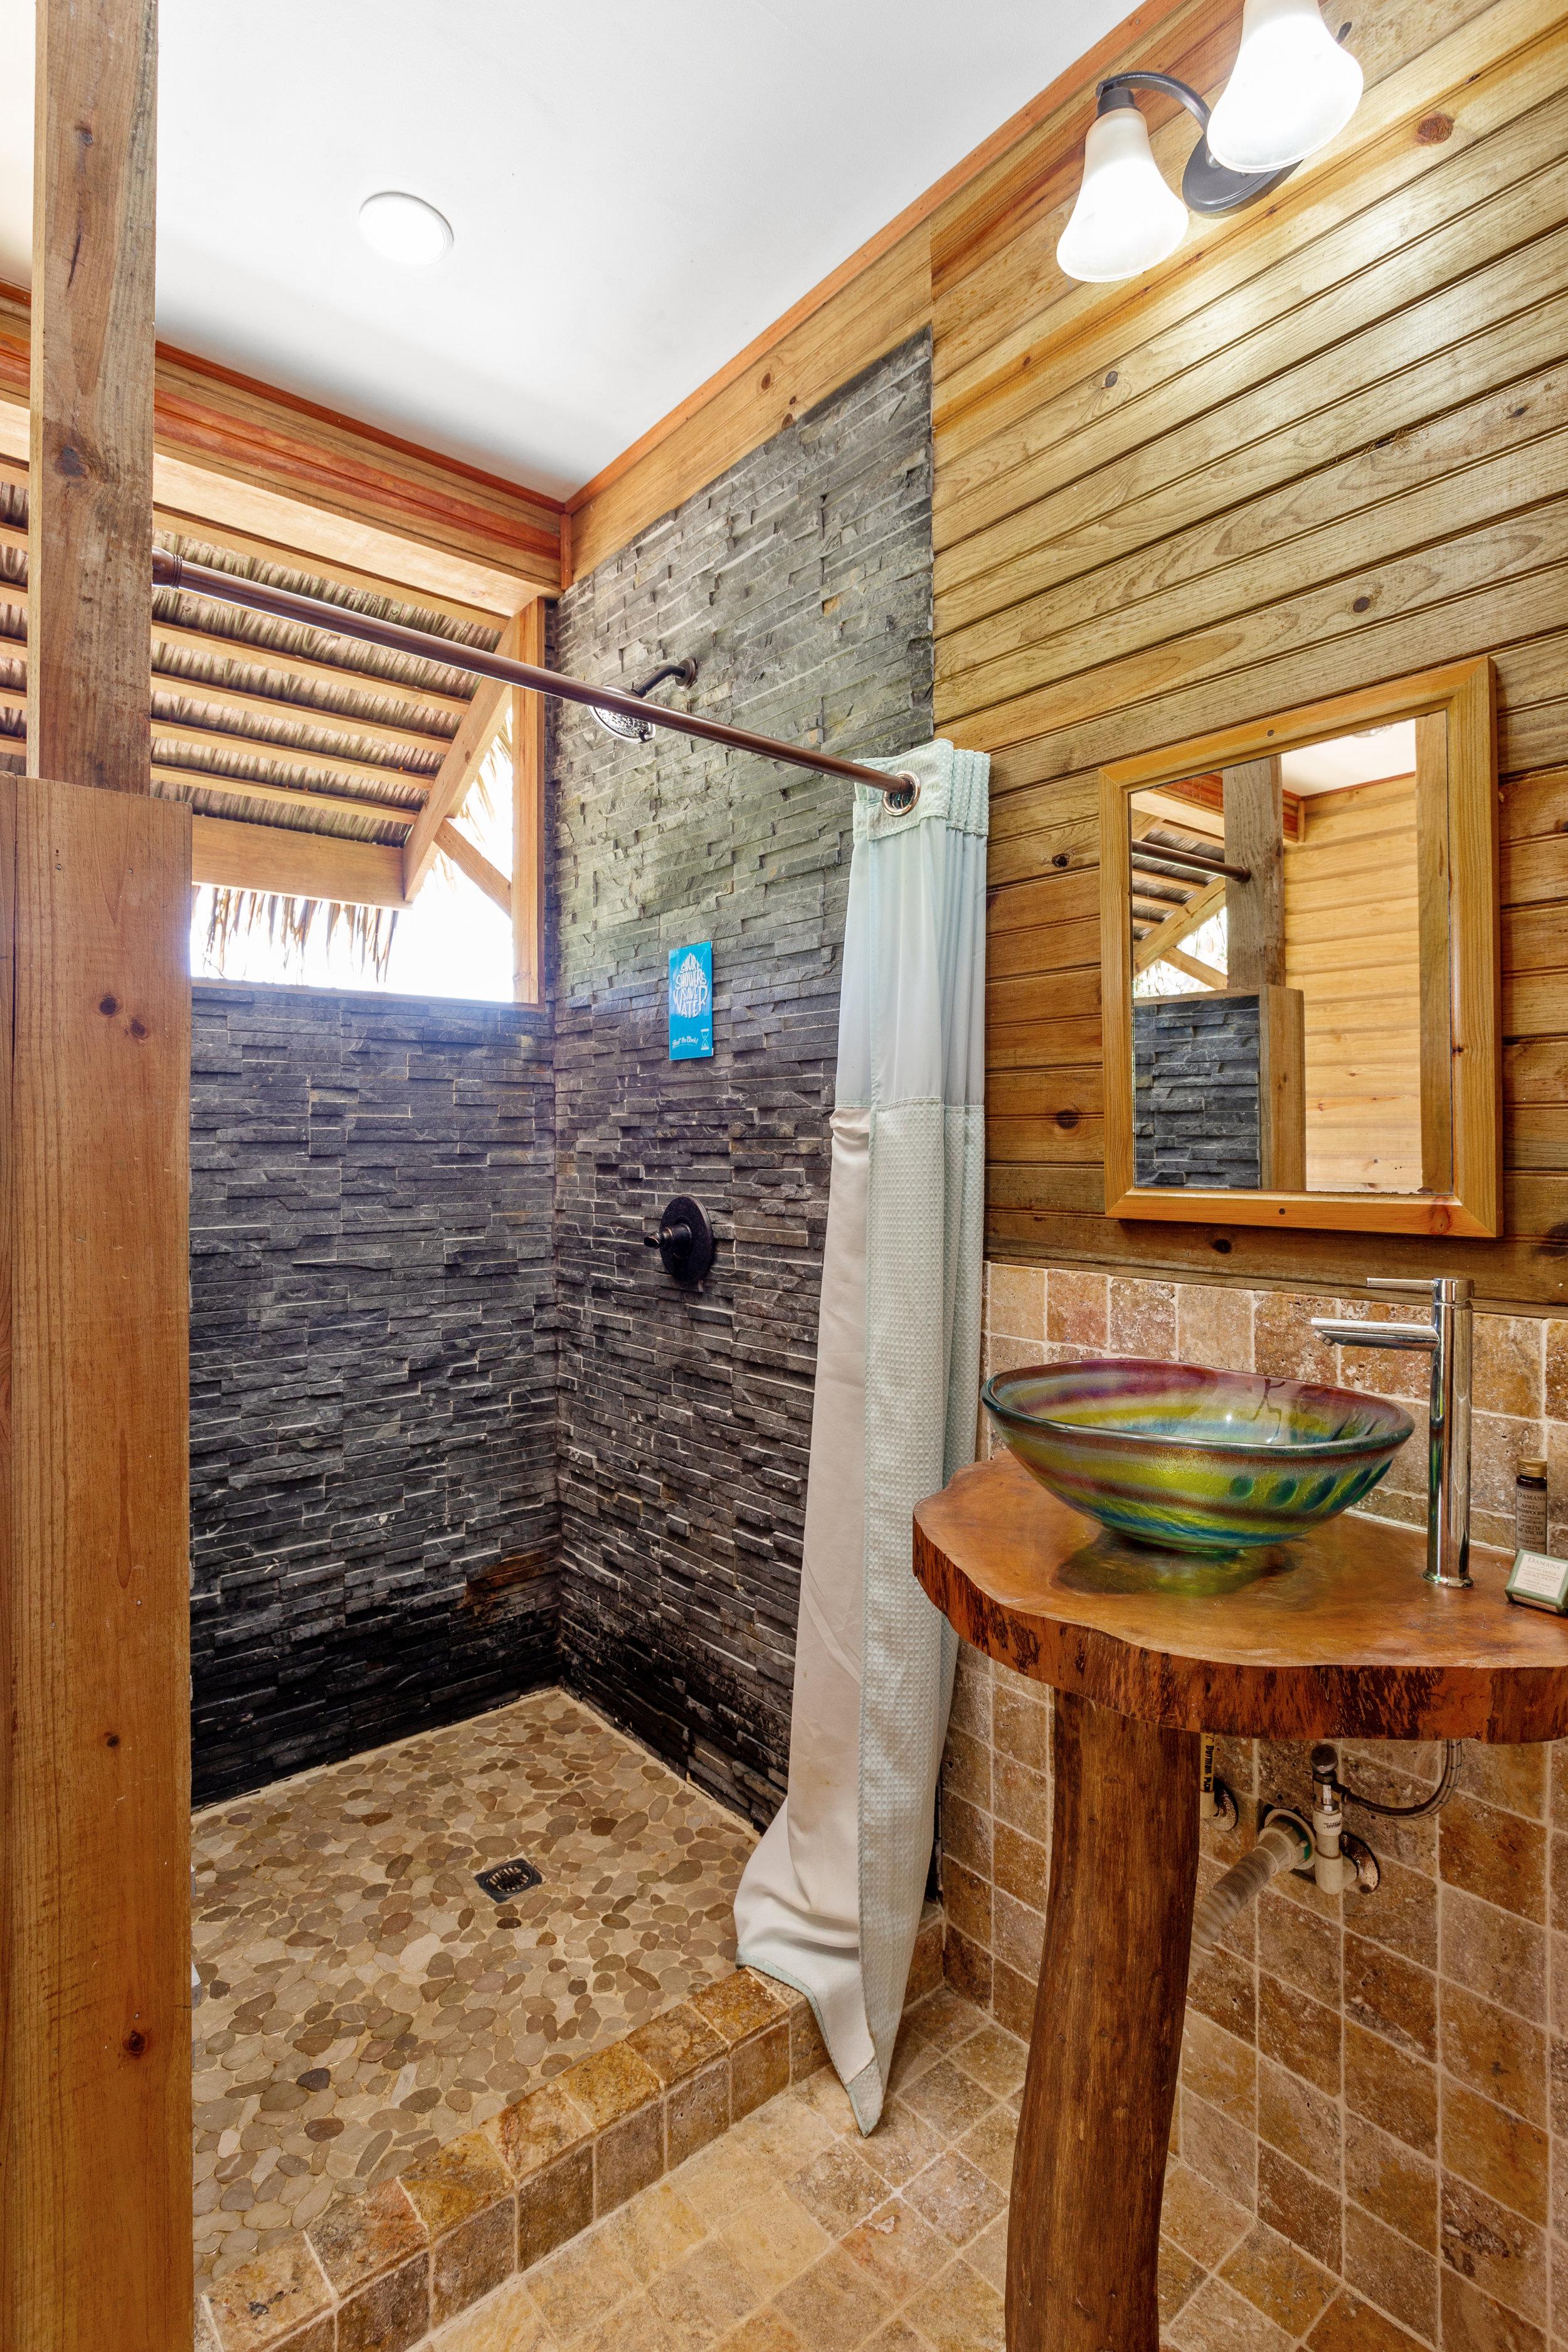 Jungle_Lodge_5_DuarteDellarole17.JPG